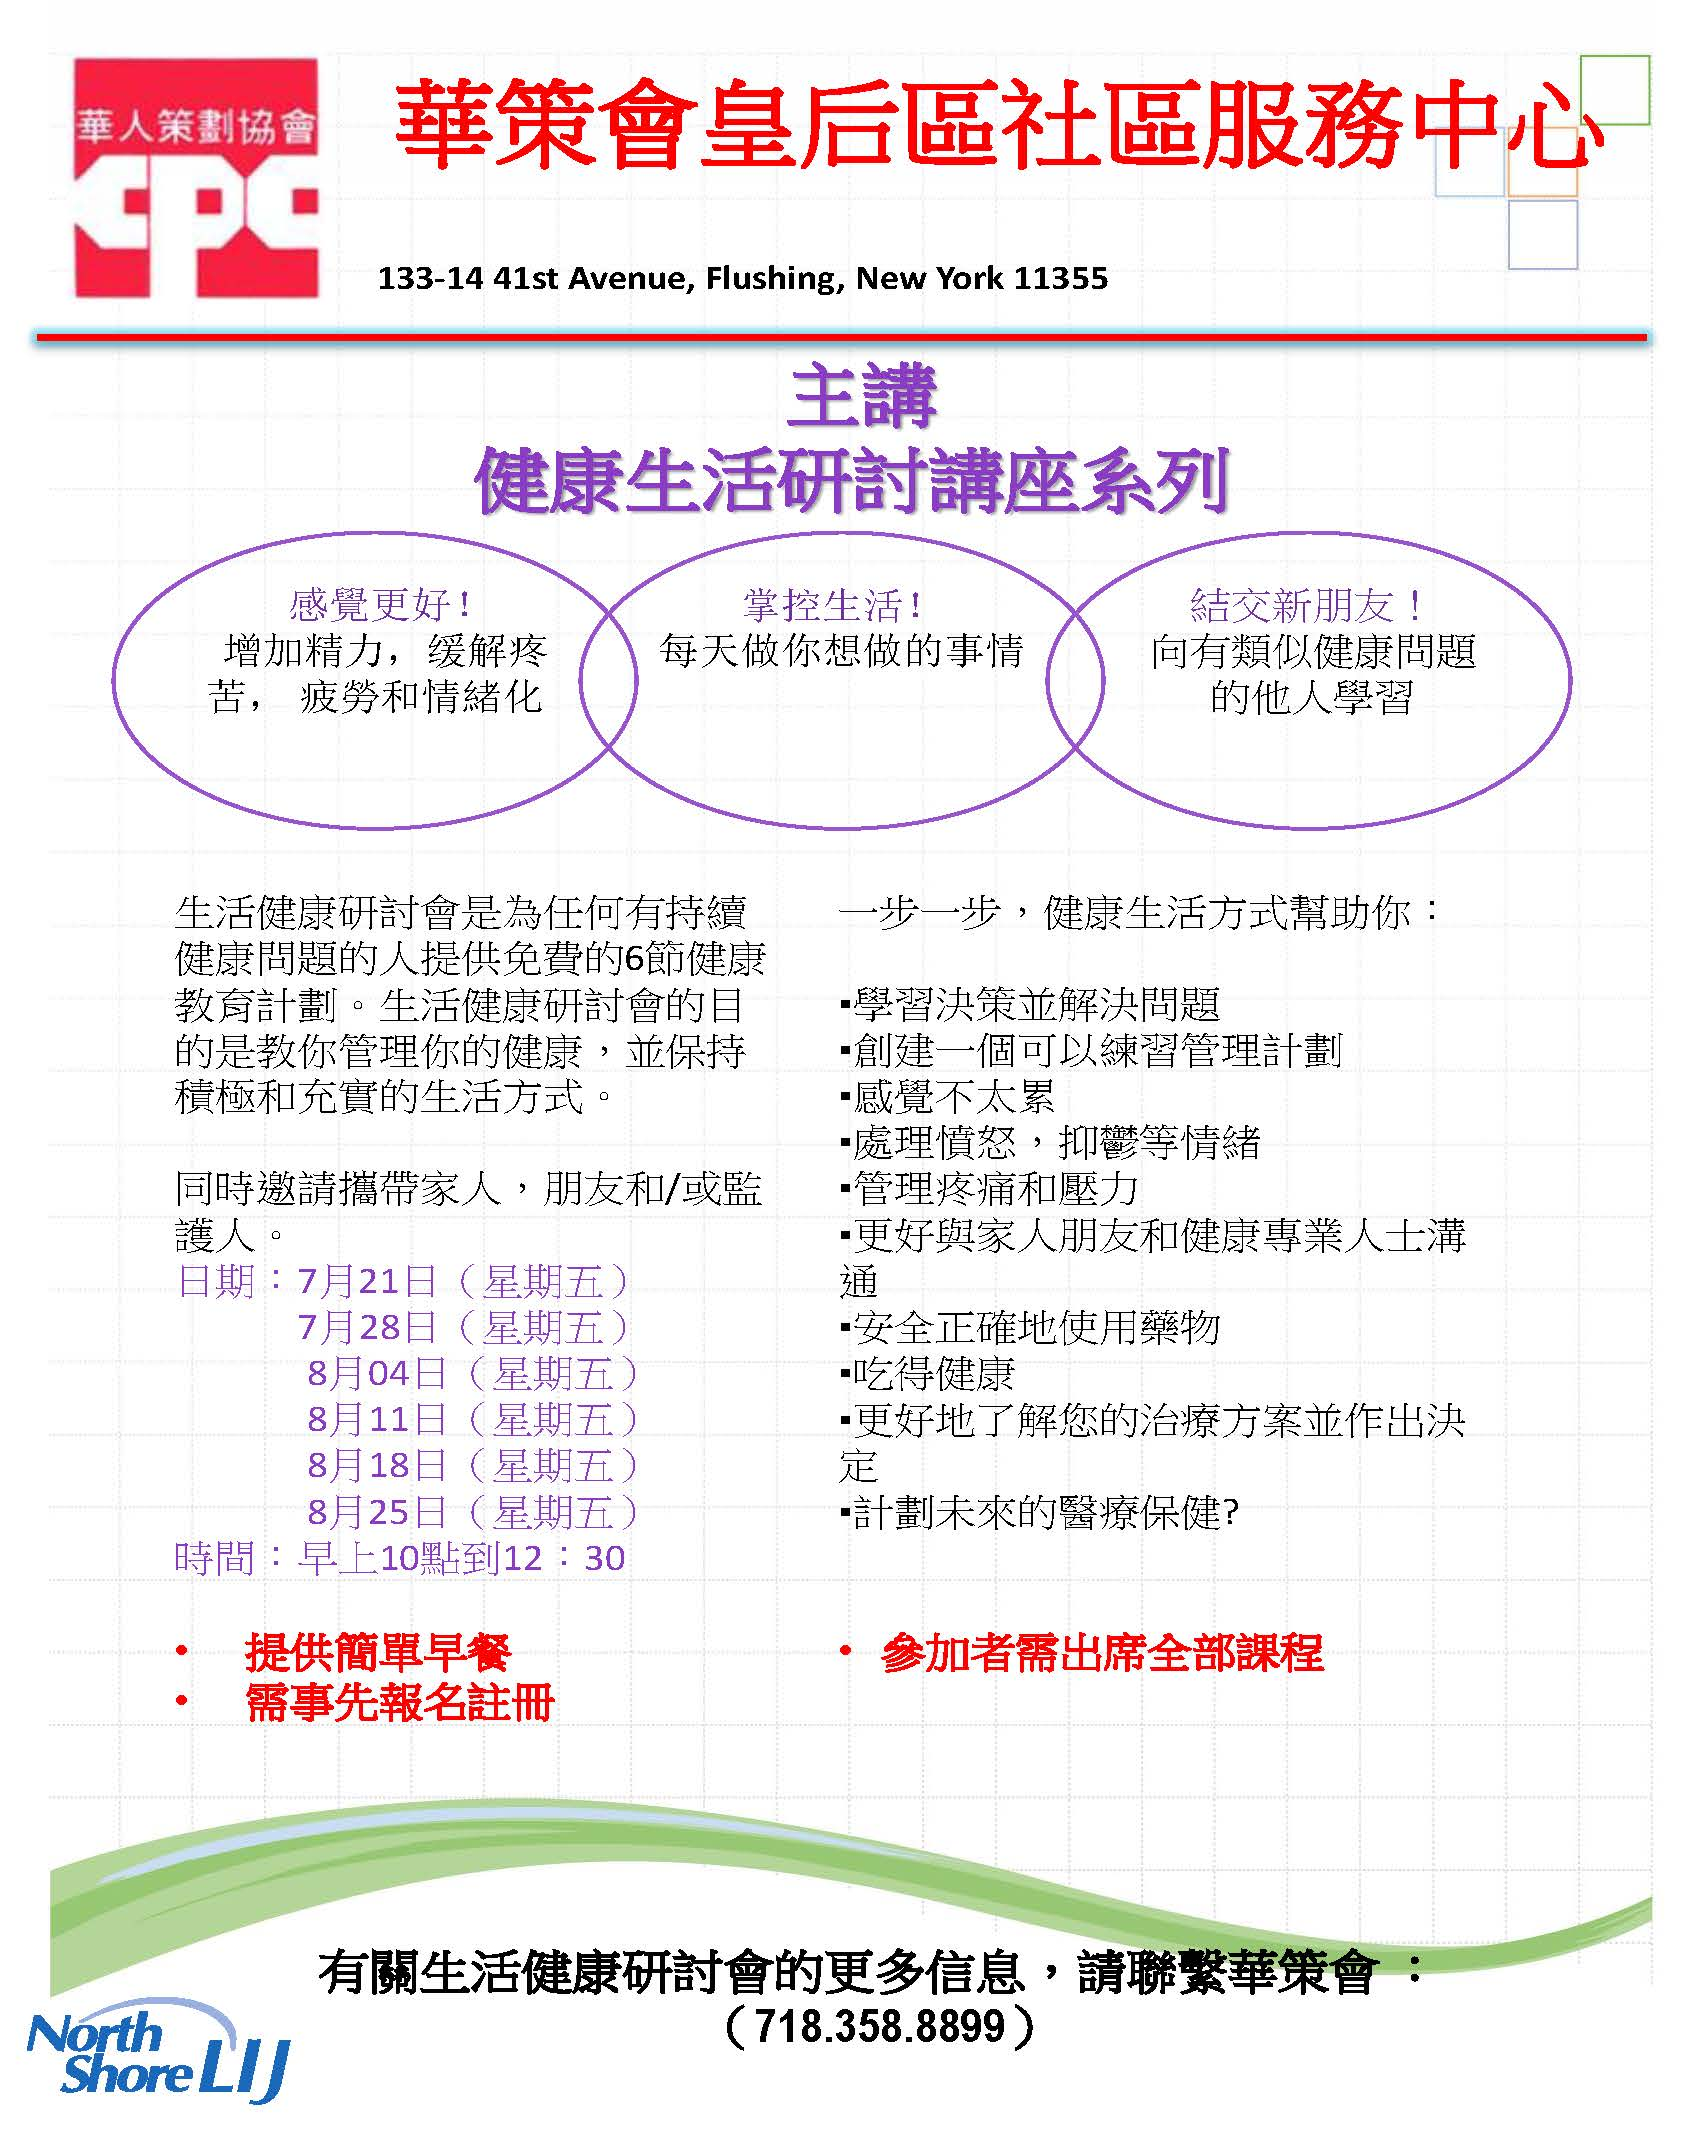 The Living Healthy Workshop Booklet